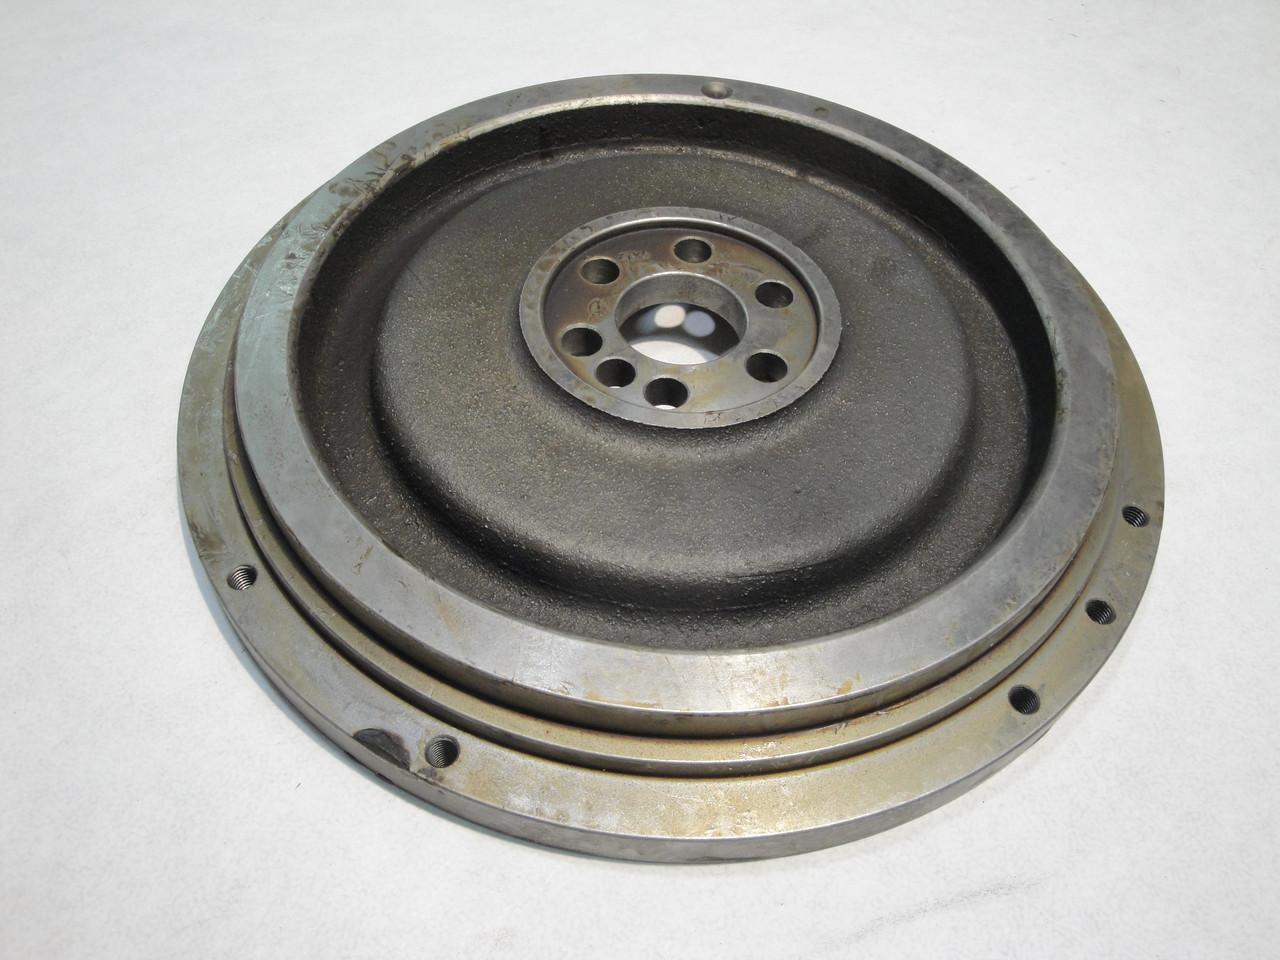 Маховик двигателя MITSUBISHI CANTER FUSO 659/859 (MITSUBISHI 4D34T) (ME012549/ME240067) JAPACO